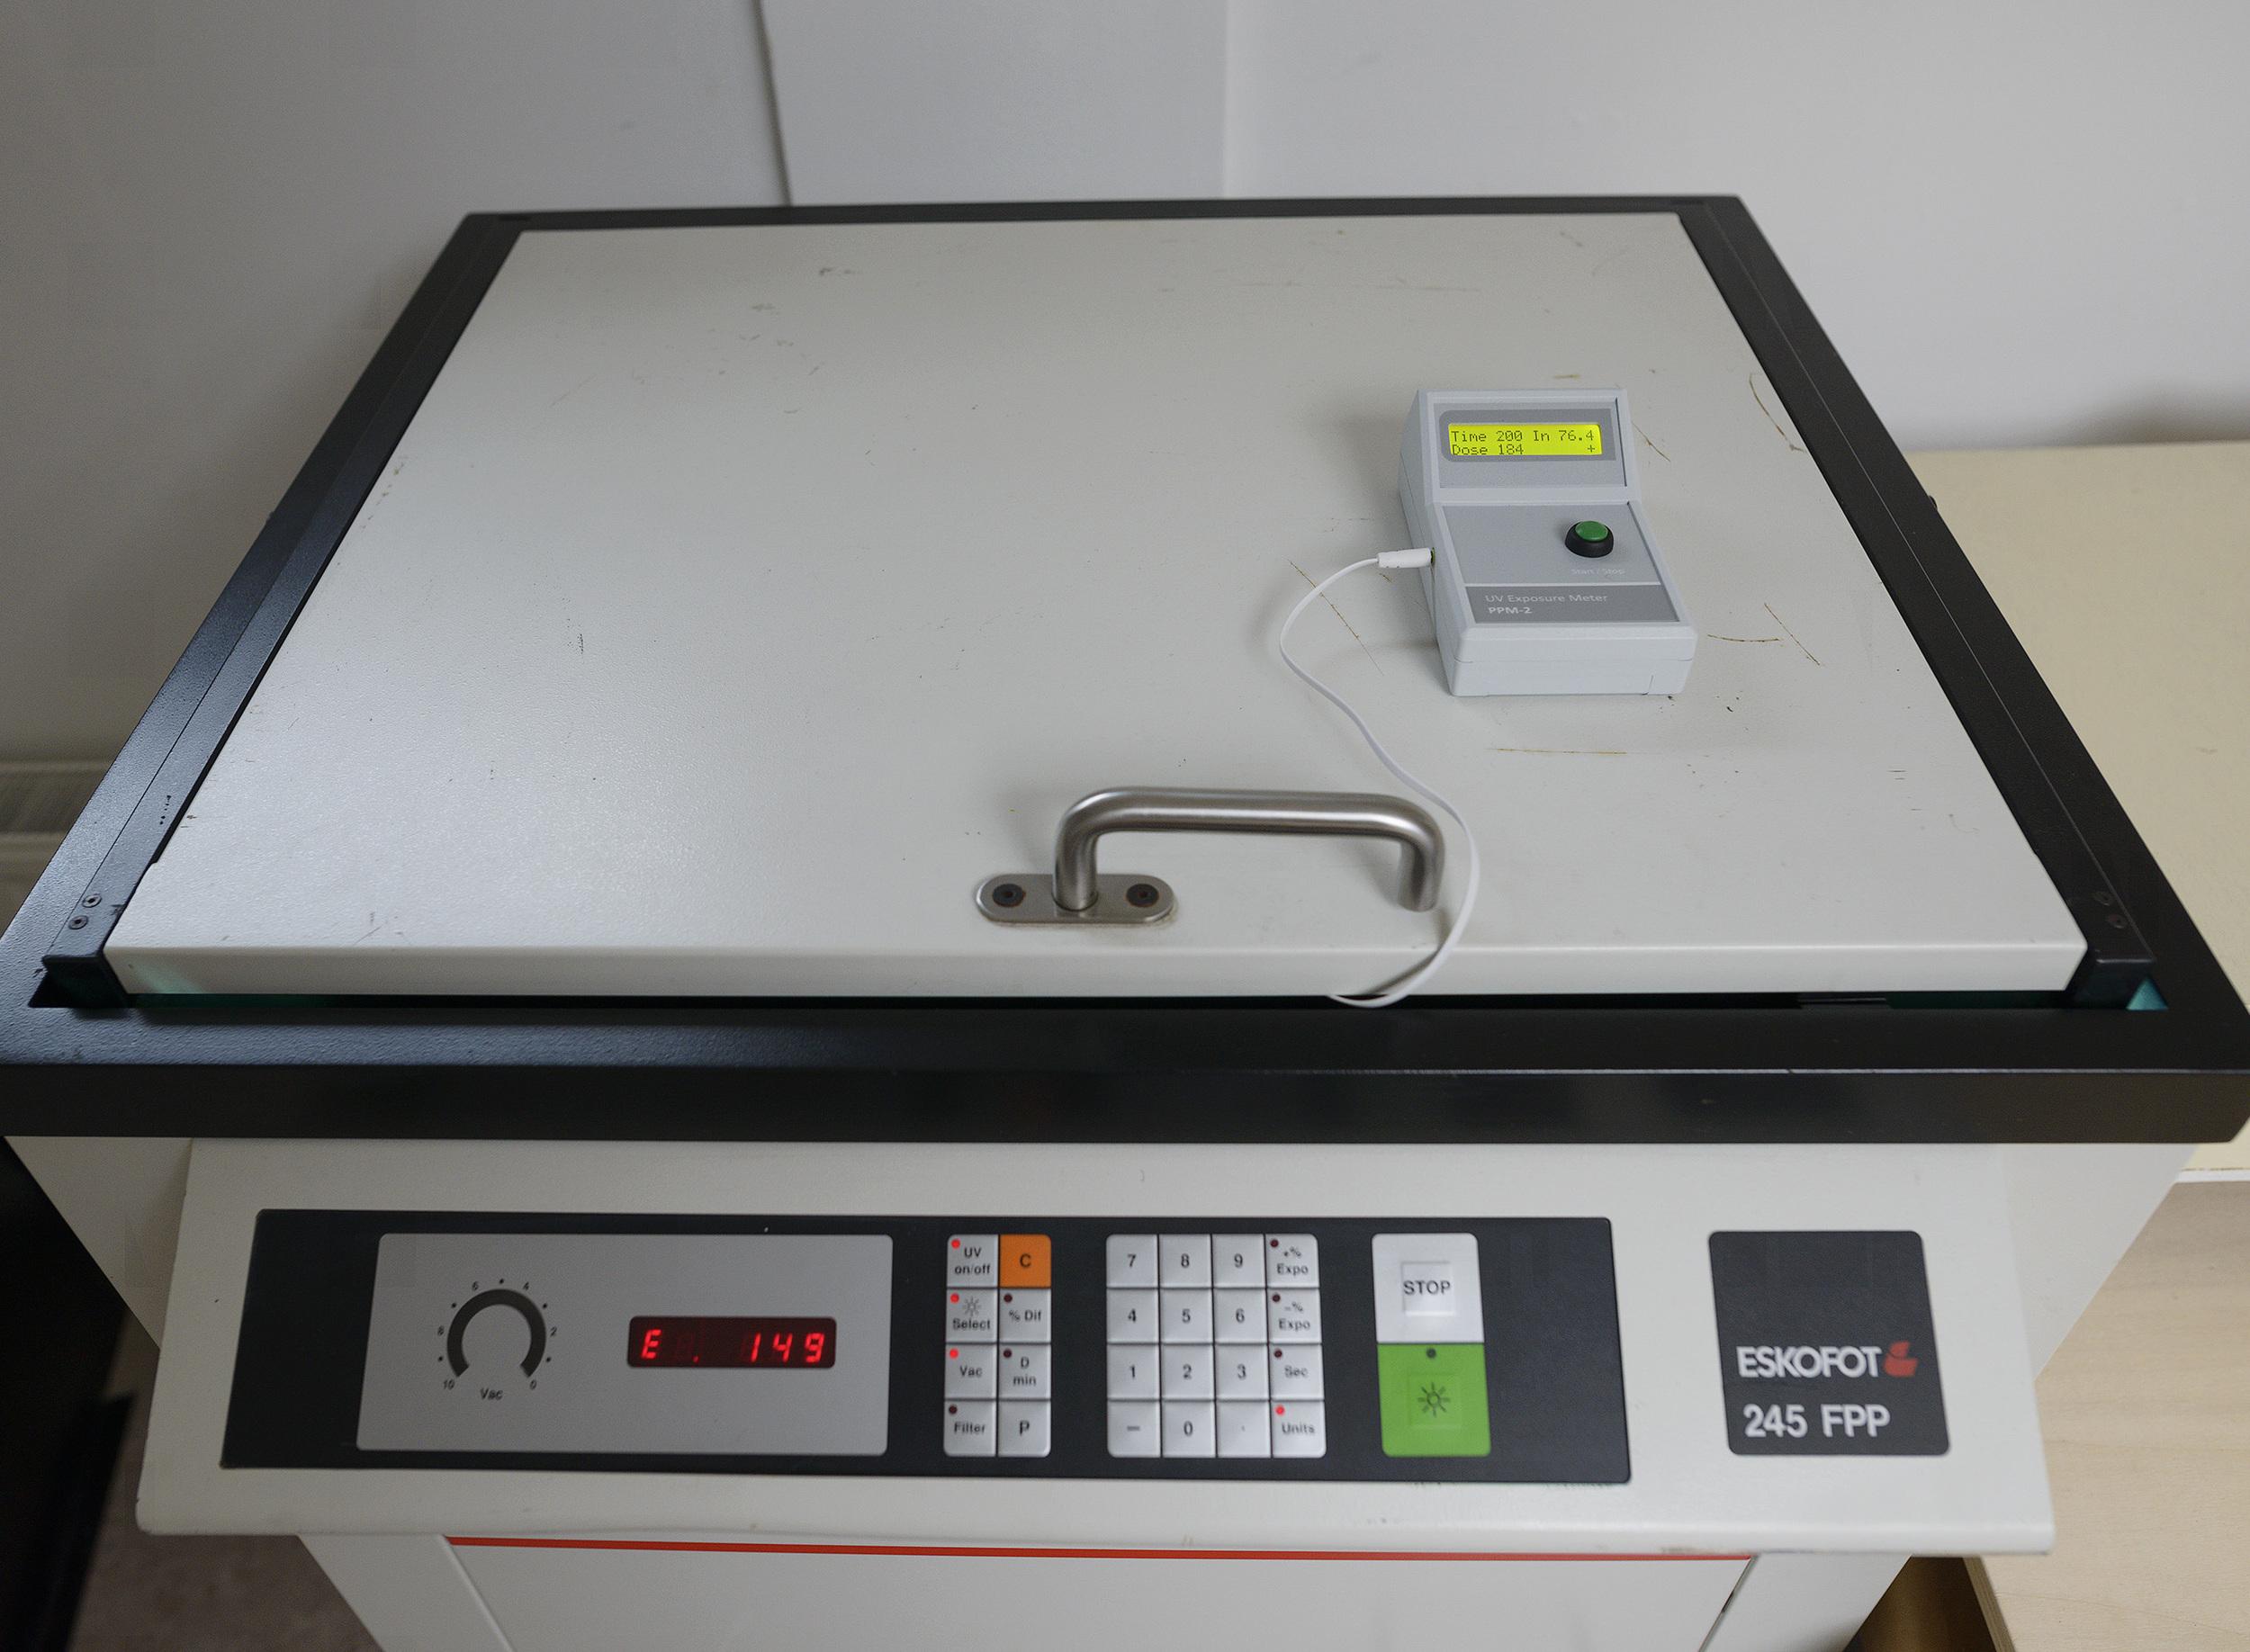 PPM-2 monitoring exposure with an Eskofot plate burner  - courtesy of    Kees Brandenburg   , Netherlands